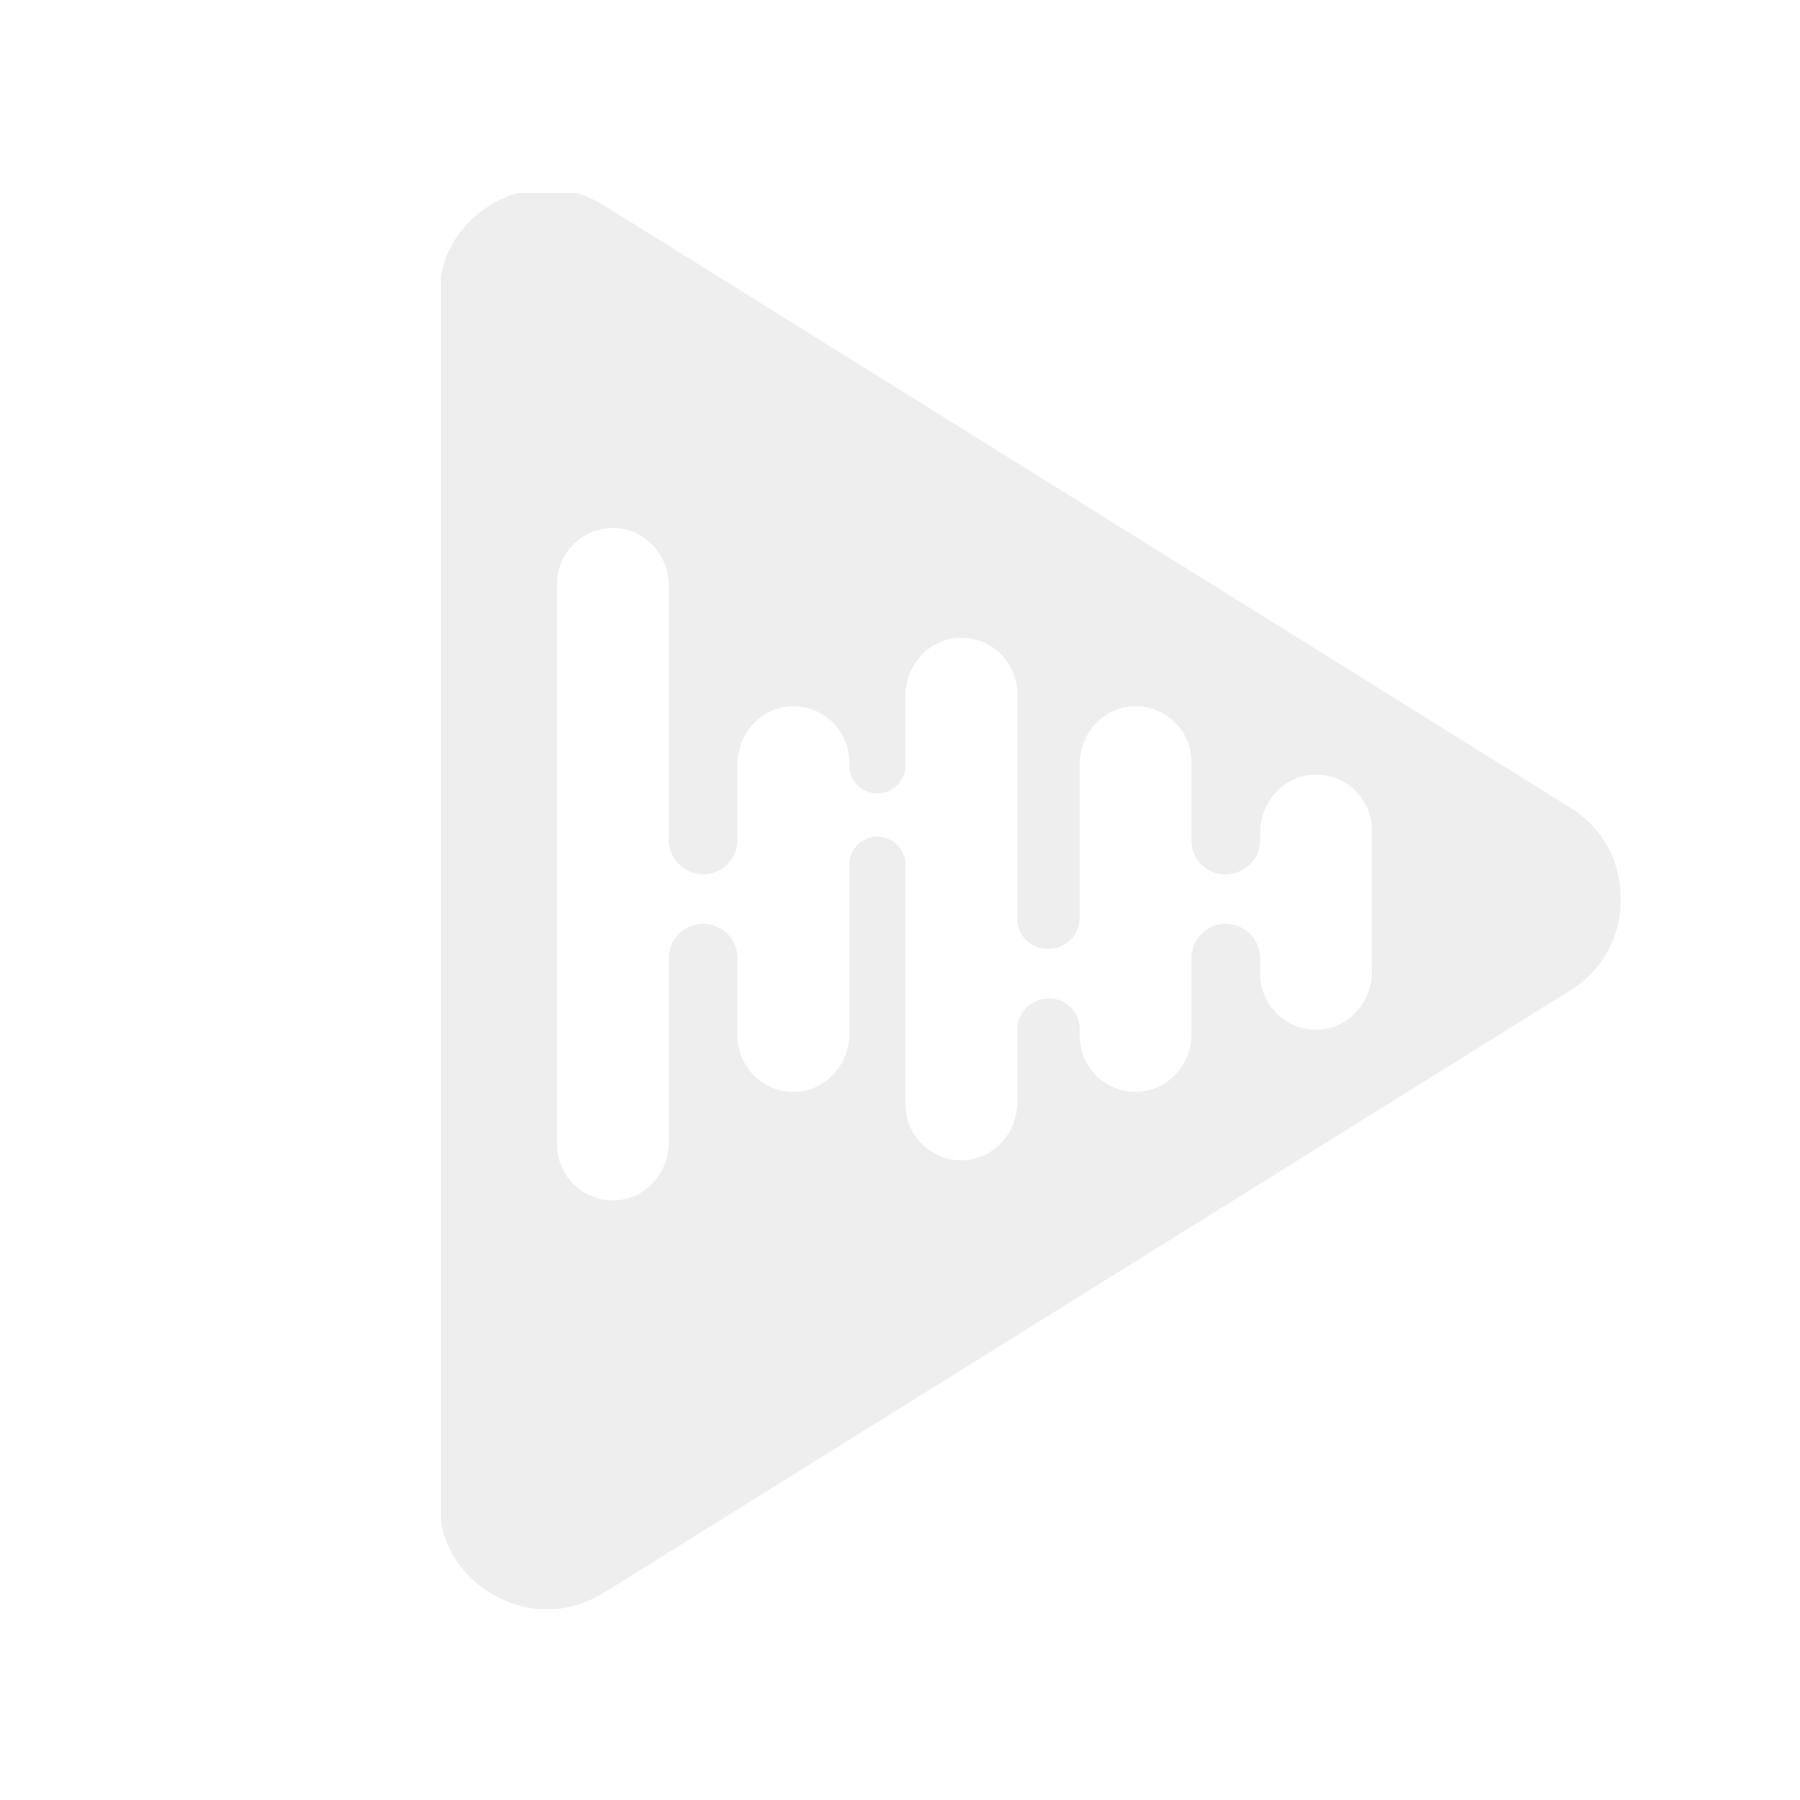 Phonocar VM271 - Biltilpasset ryggekamera